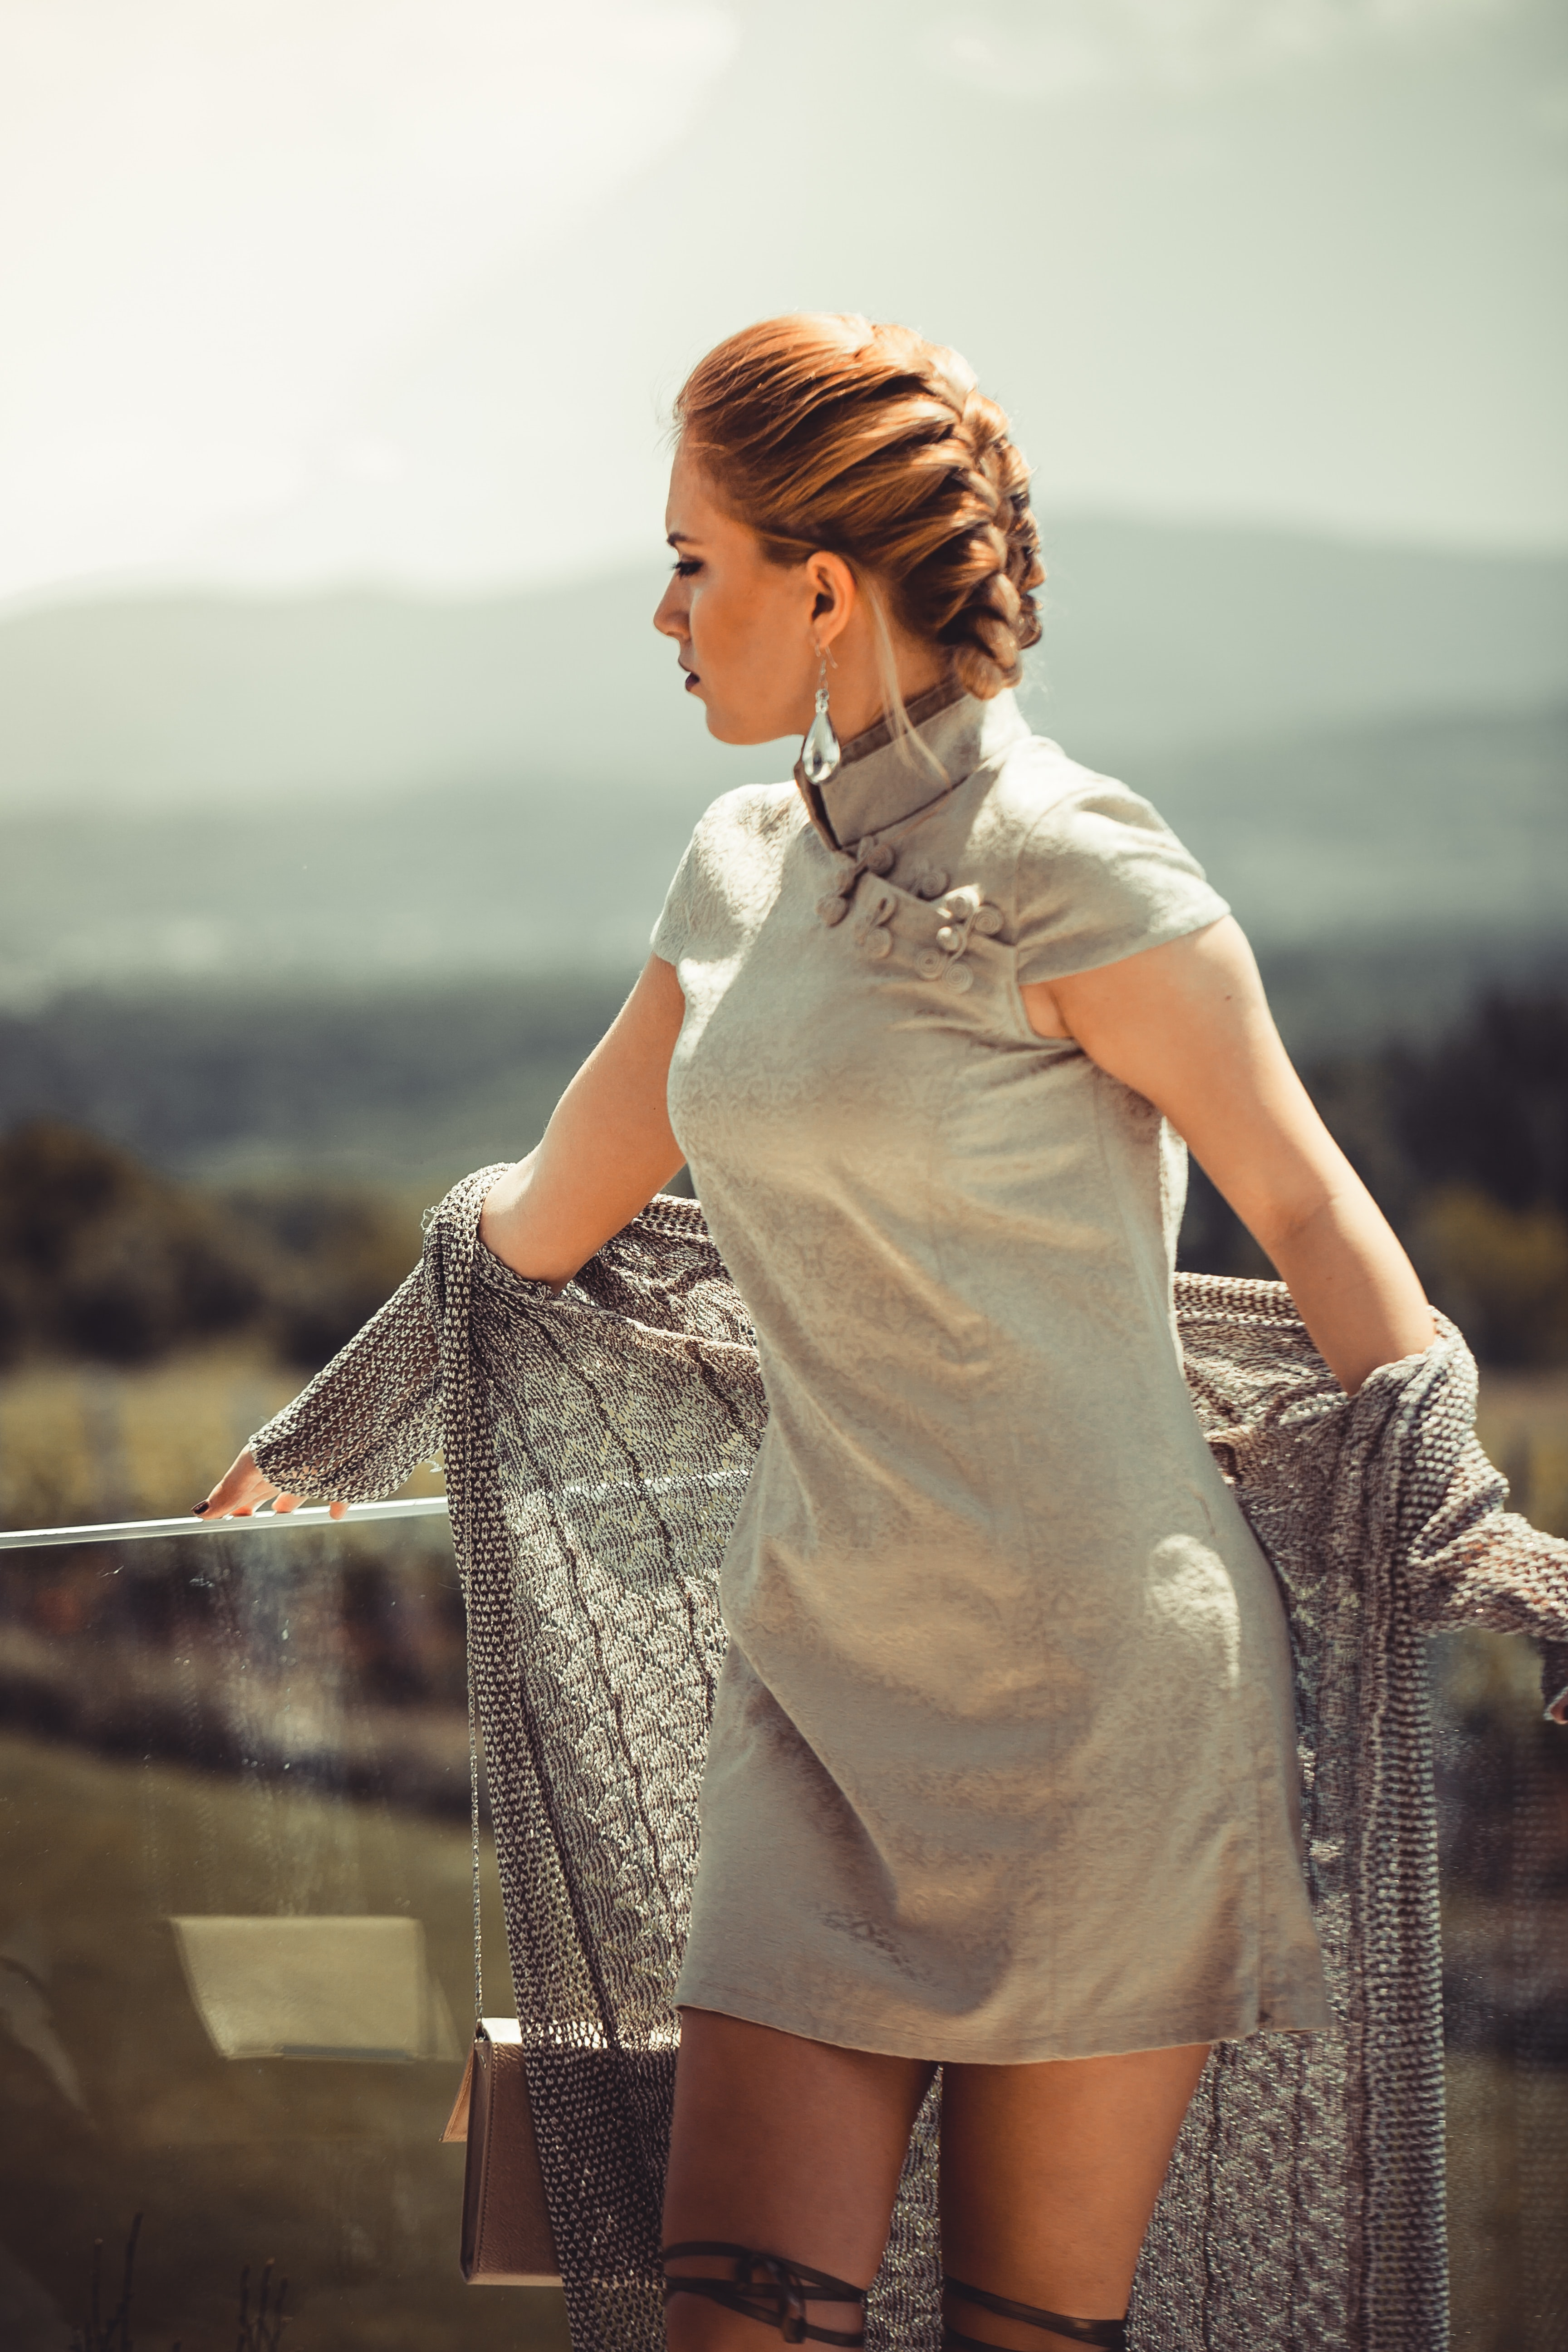 braided hair woman taking photo in corner of glass railings at daytime